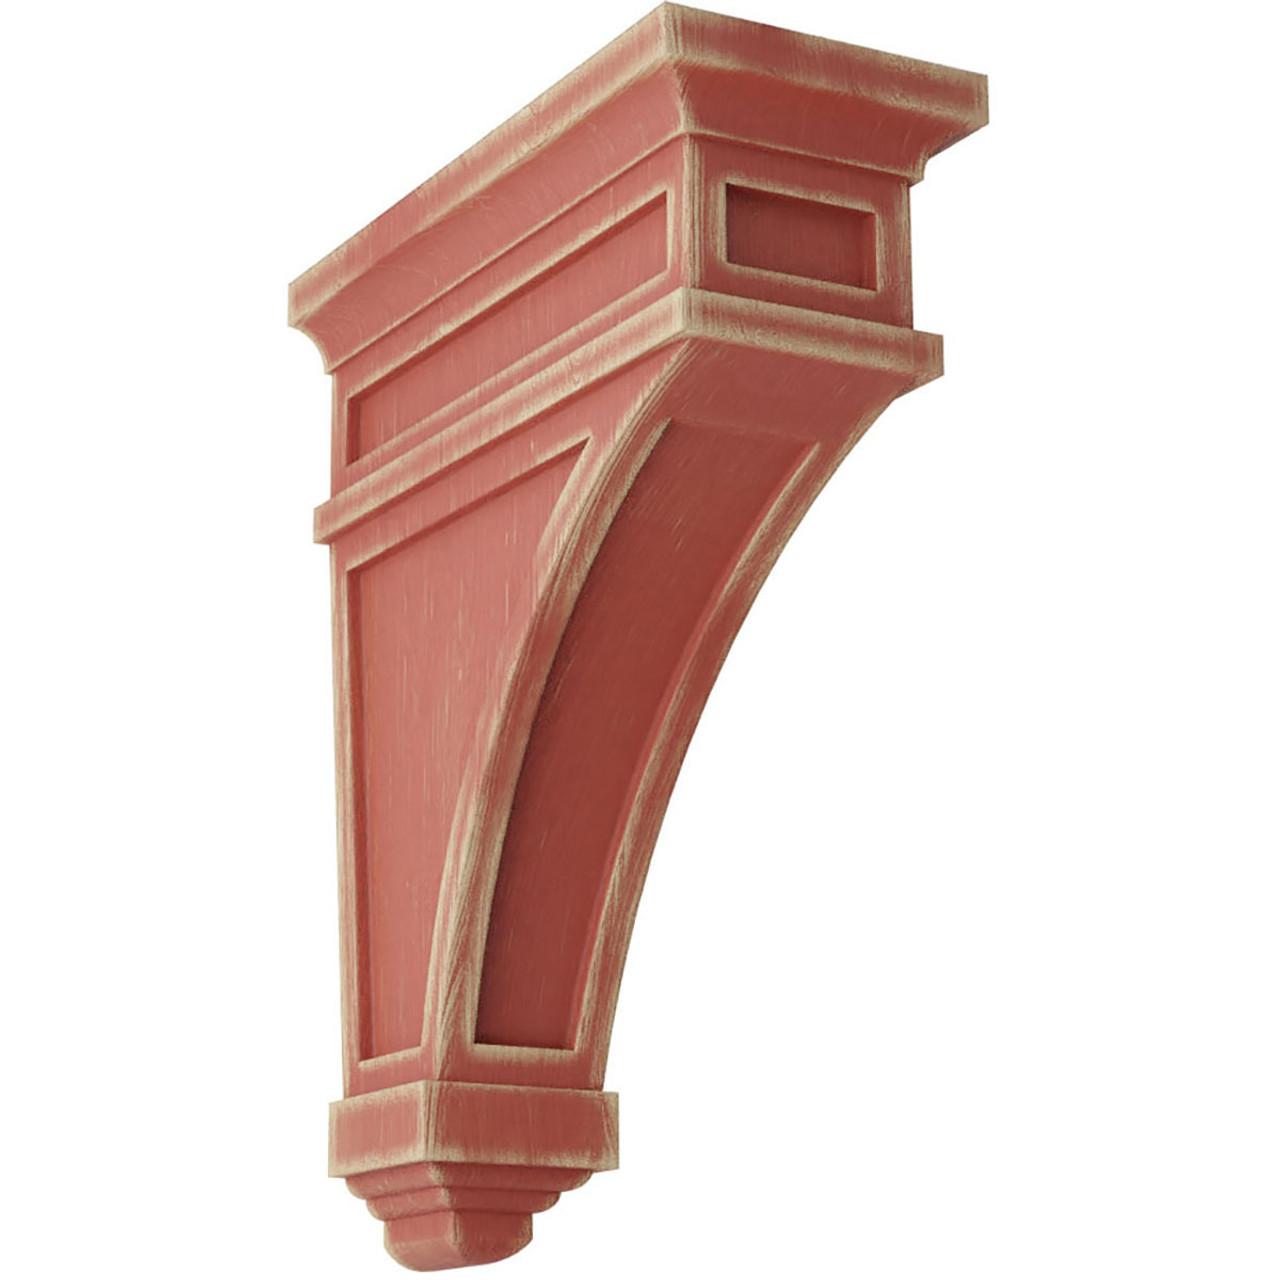 "4""W x 4""D x 12""H Arts and Crafts Wood Vintage Decor Corbel Restoration White"